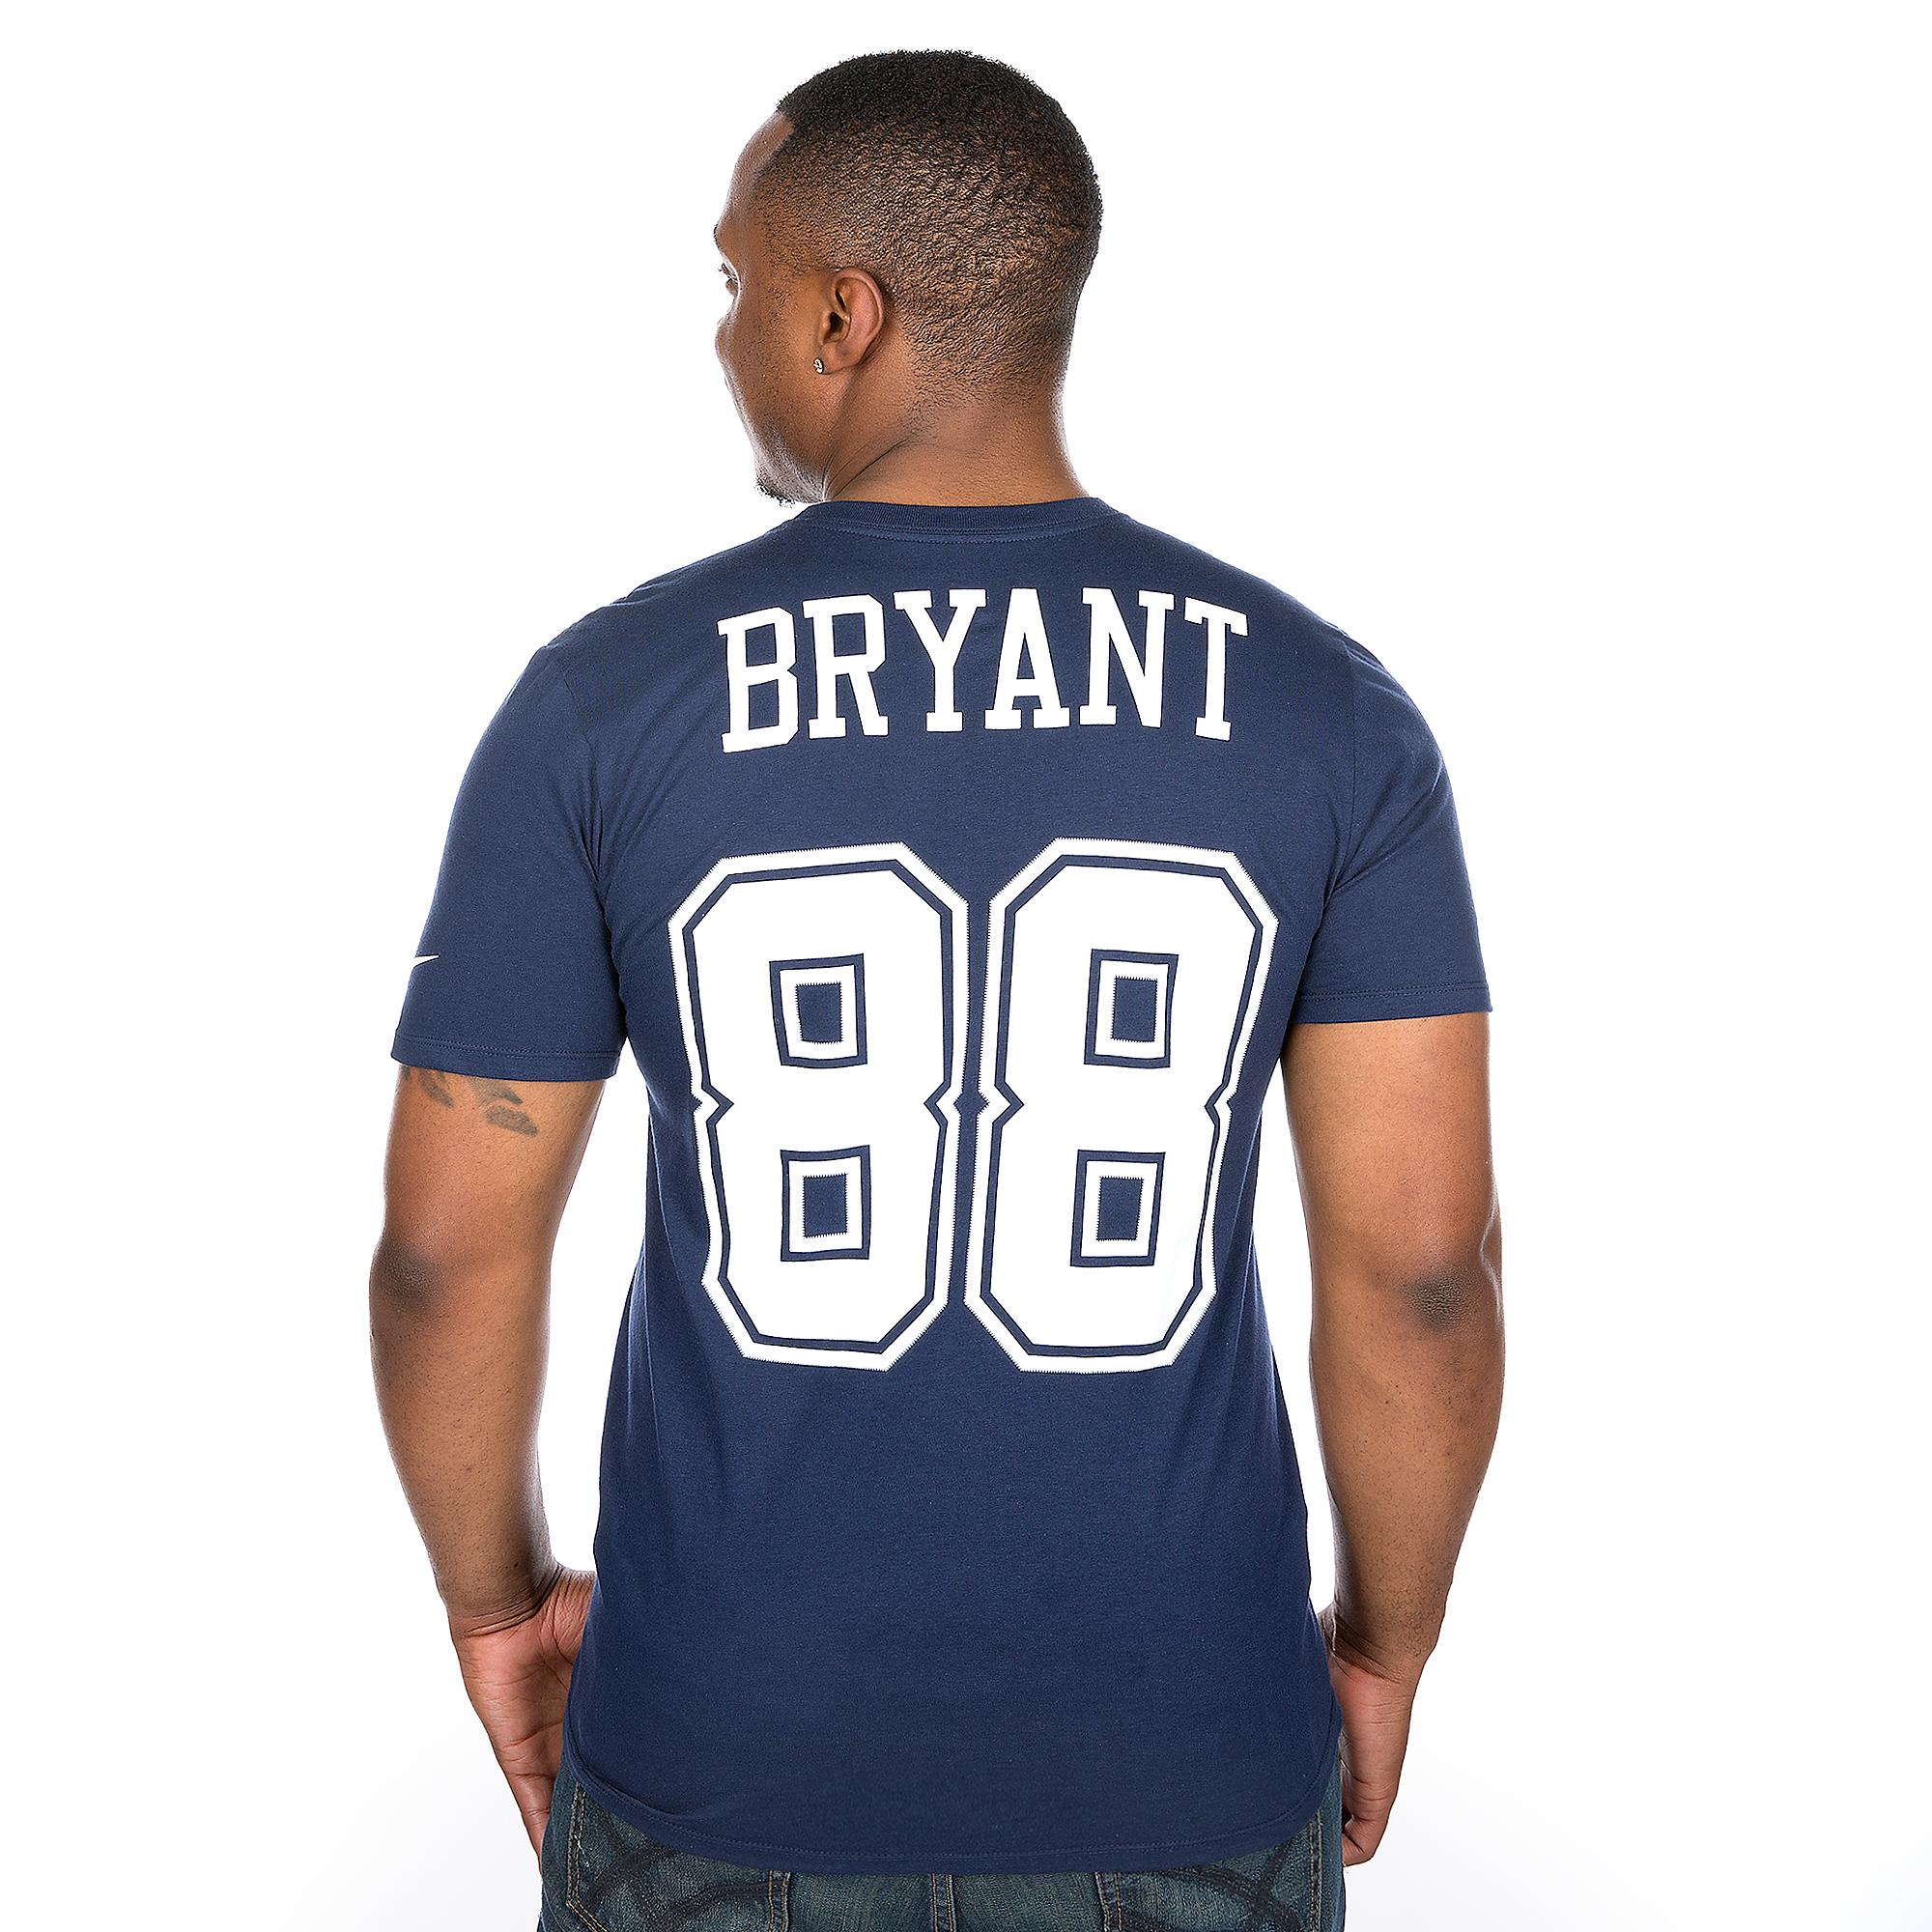 1256aaf2f Dallas Cowboys Dez Bryant #88 Nike Player Pride 2 Tee | Fans United